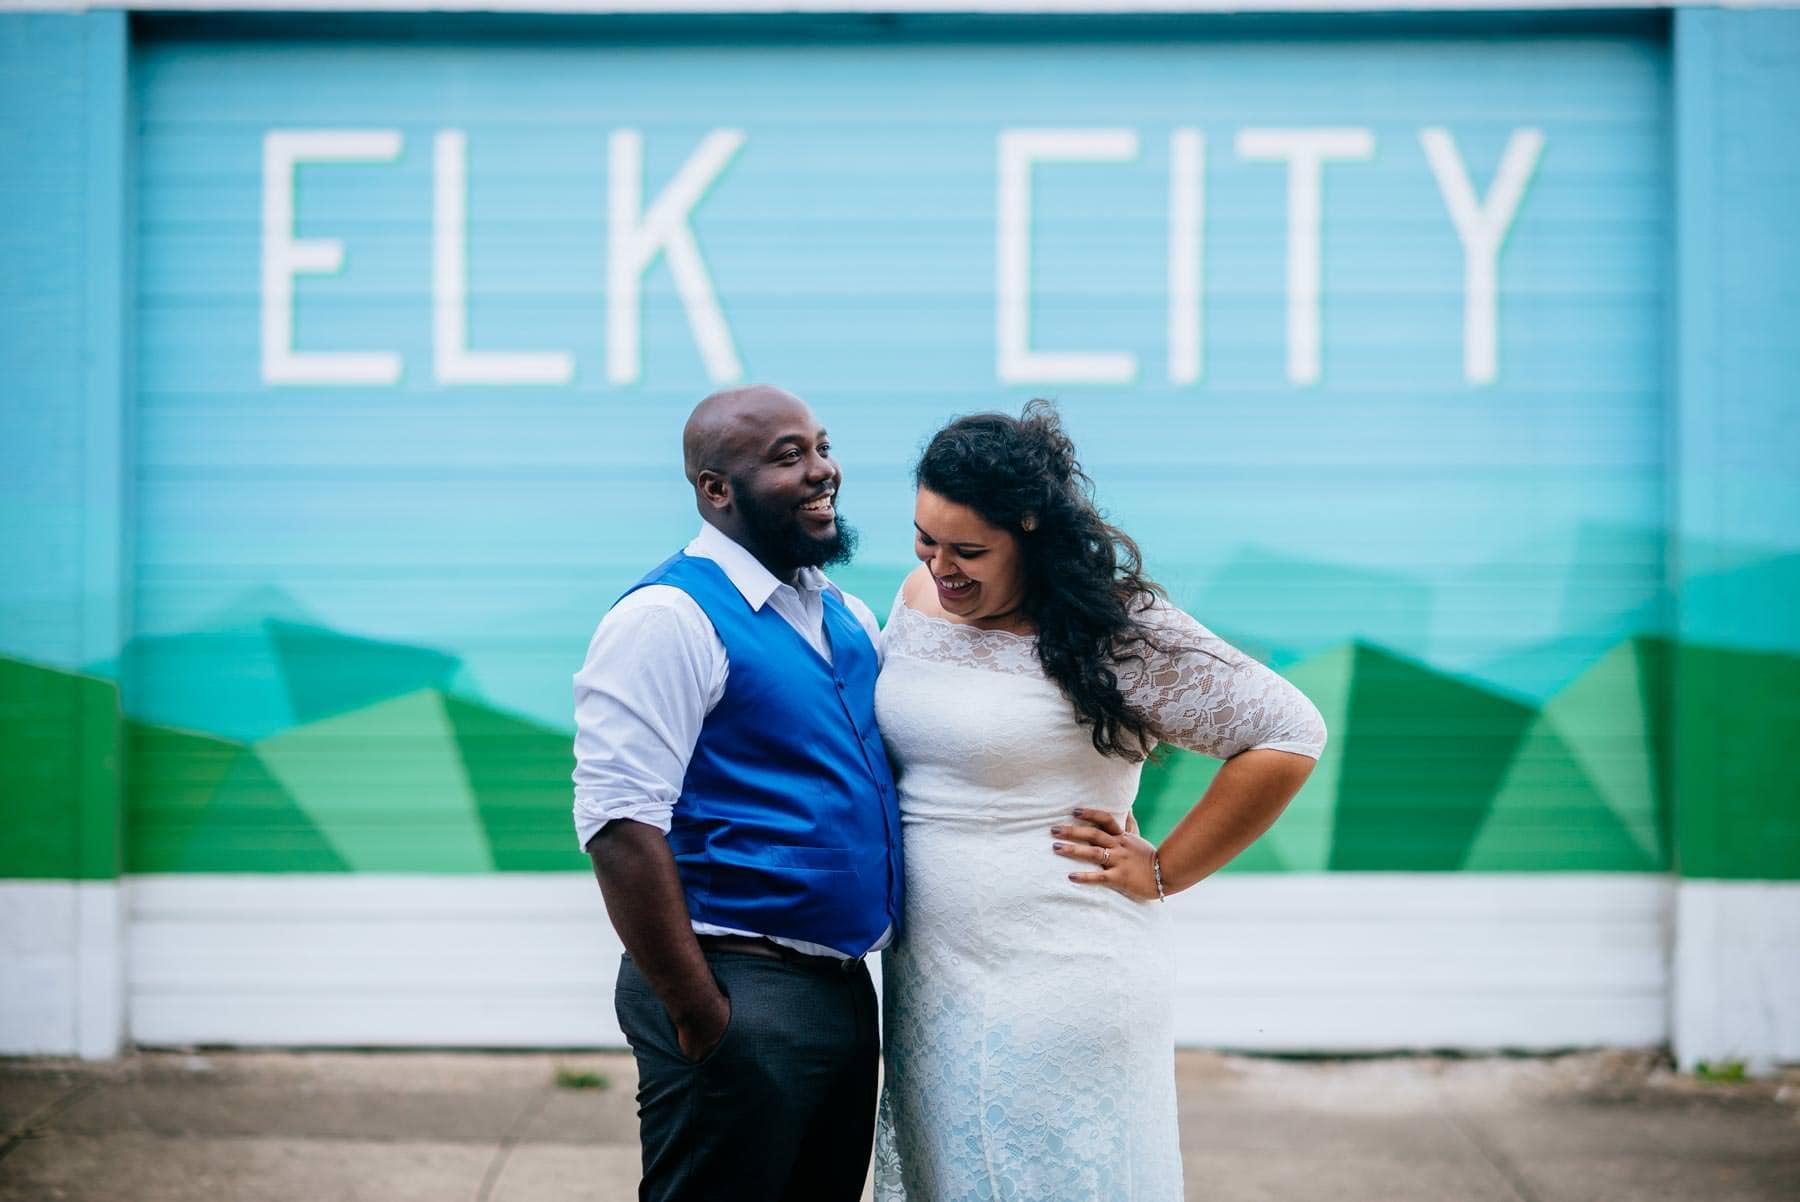 west side elk city charleston wedding